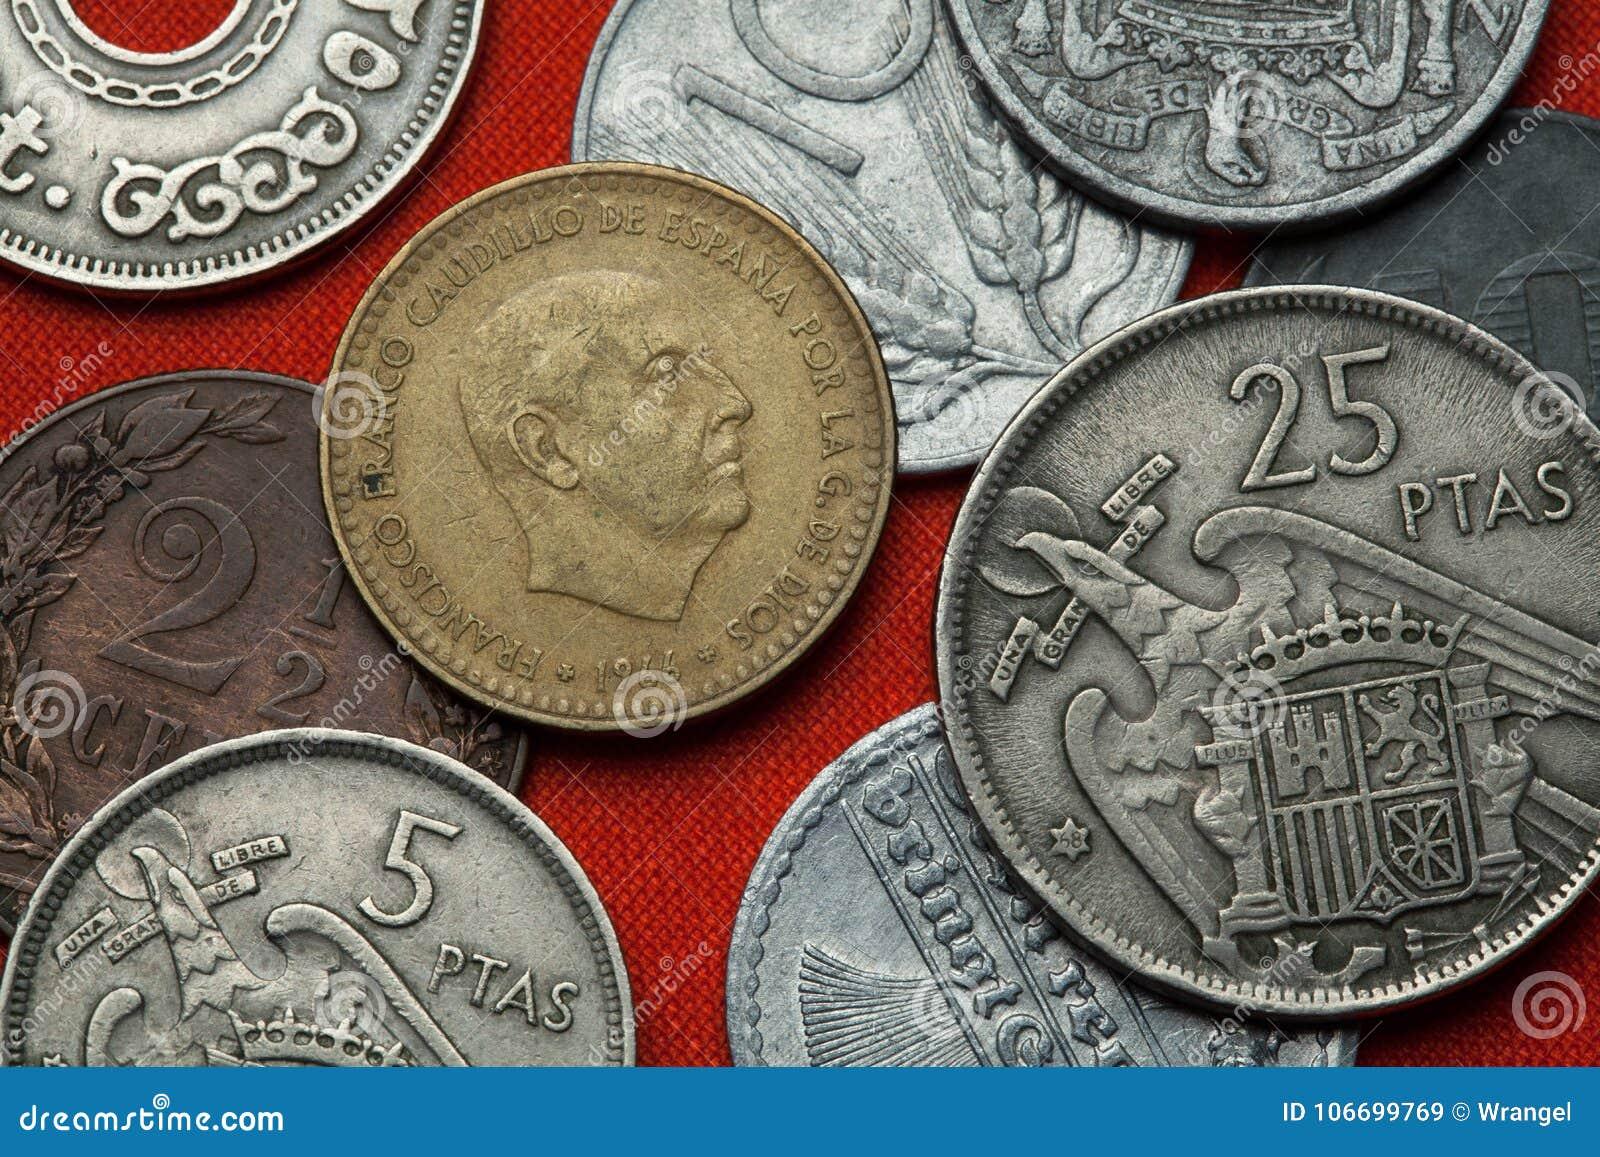 Mynt av Spanien Spansk diktator Francisco Franco